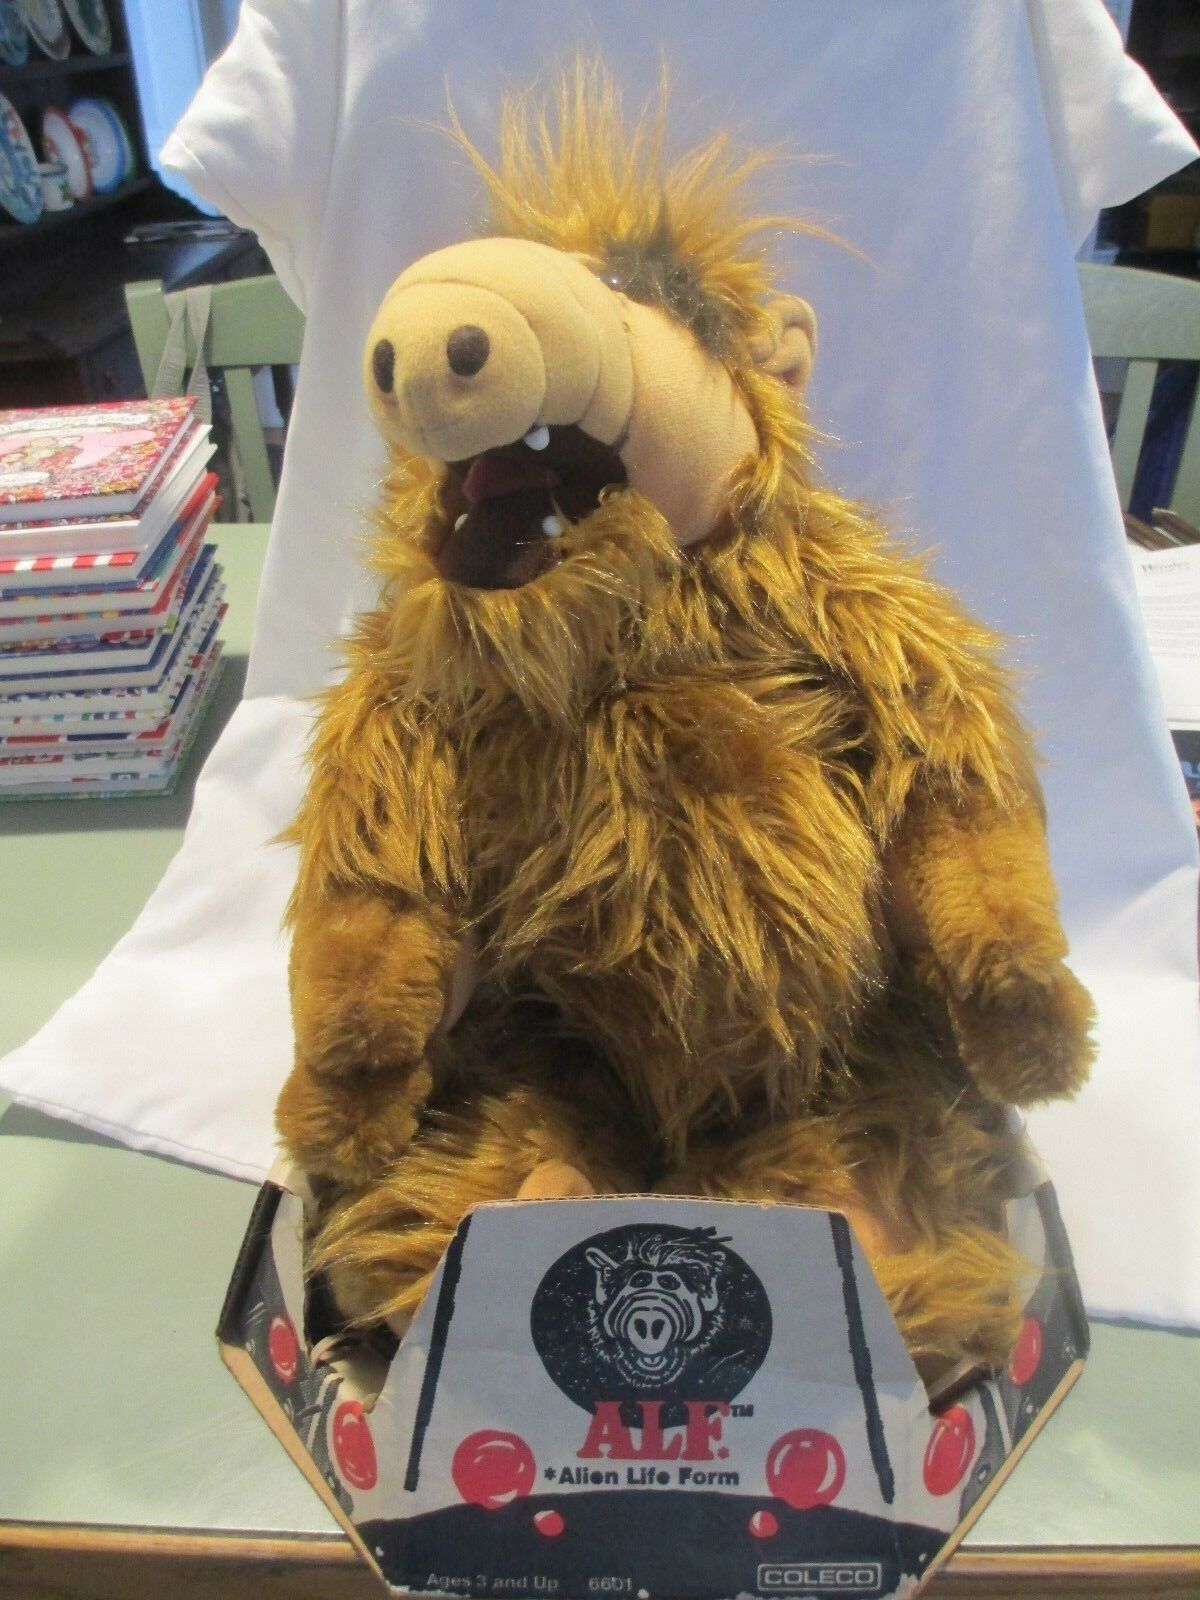 1986 Alf Alien Plush Toy Spaceship Box 18  Coleco 6601 stuffed animal life form